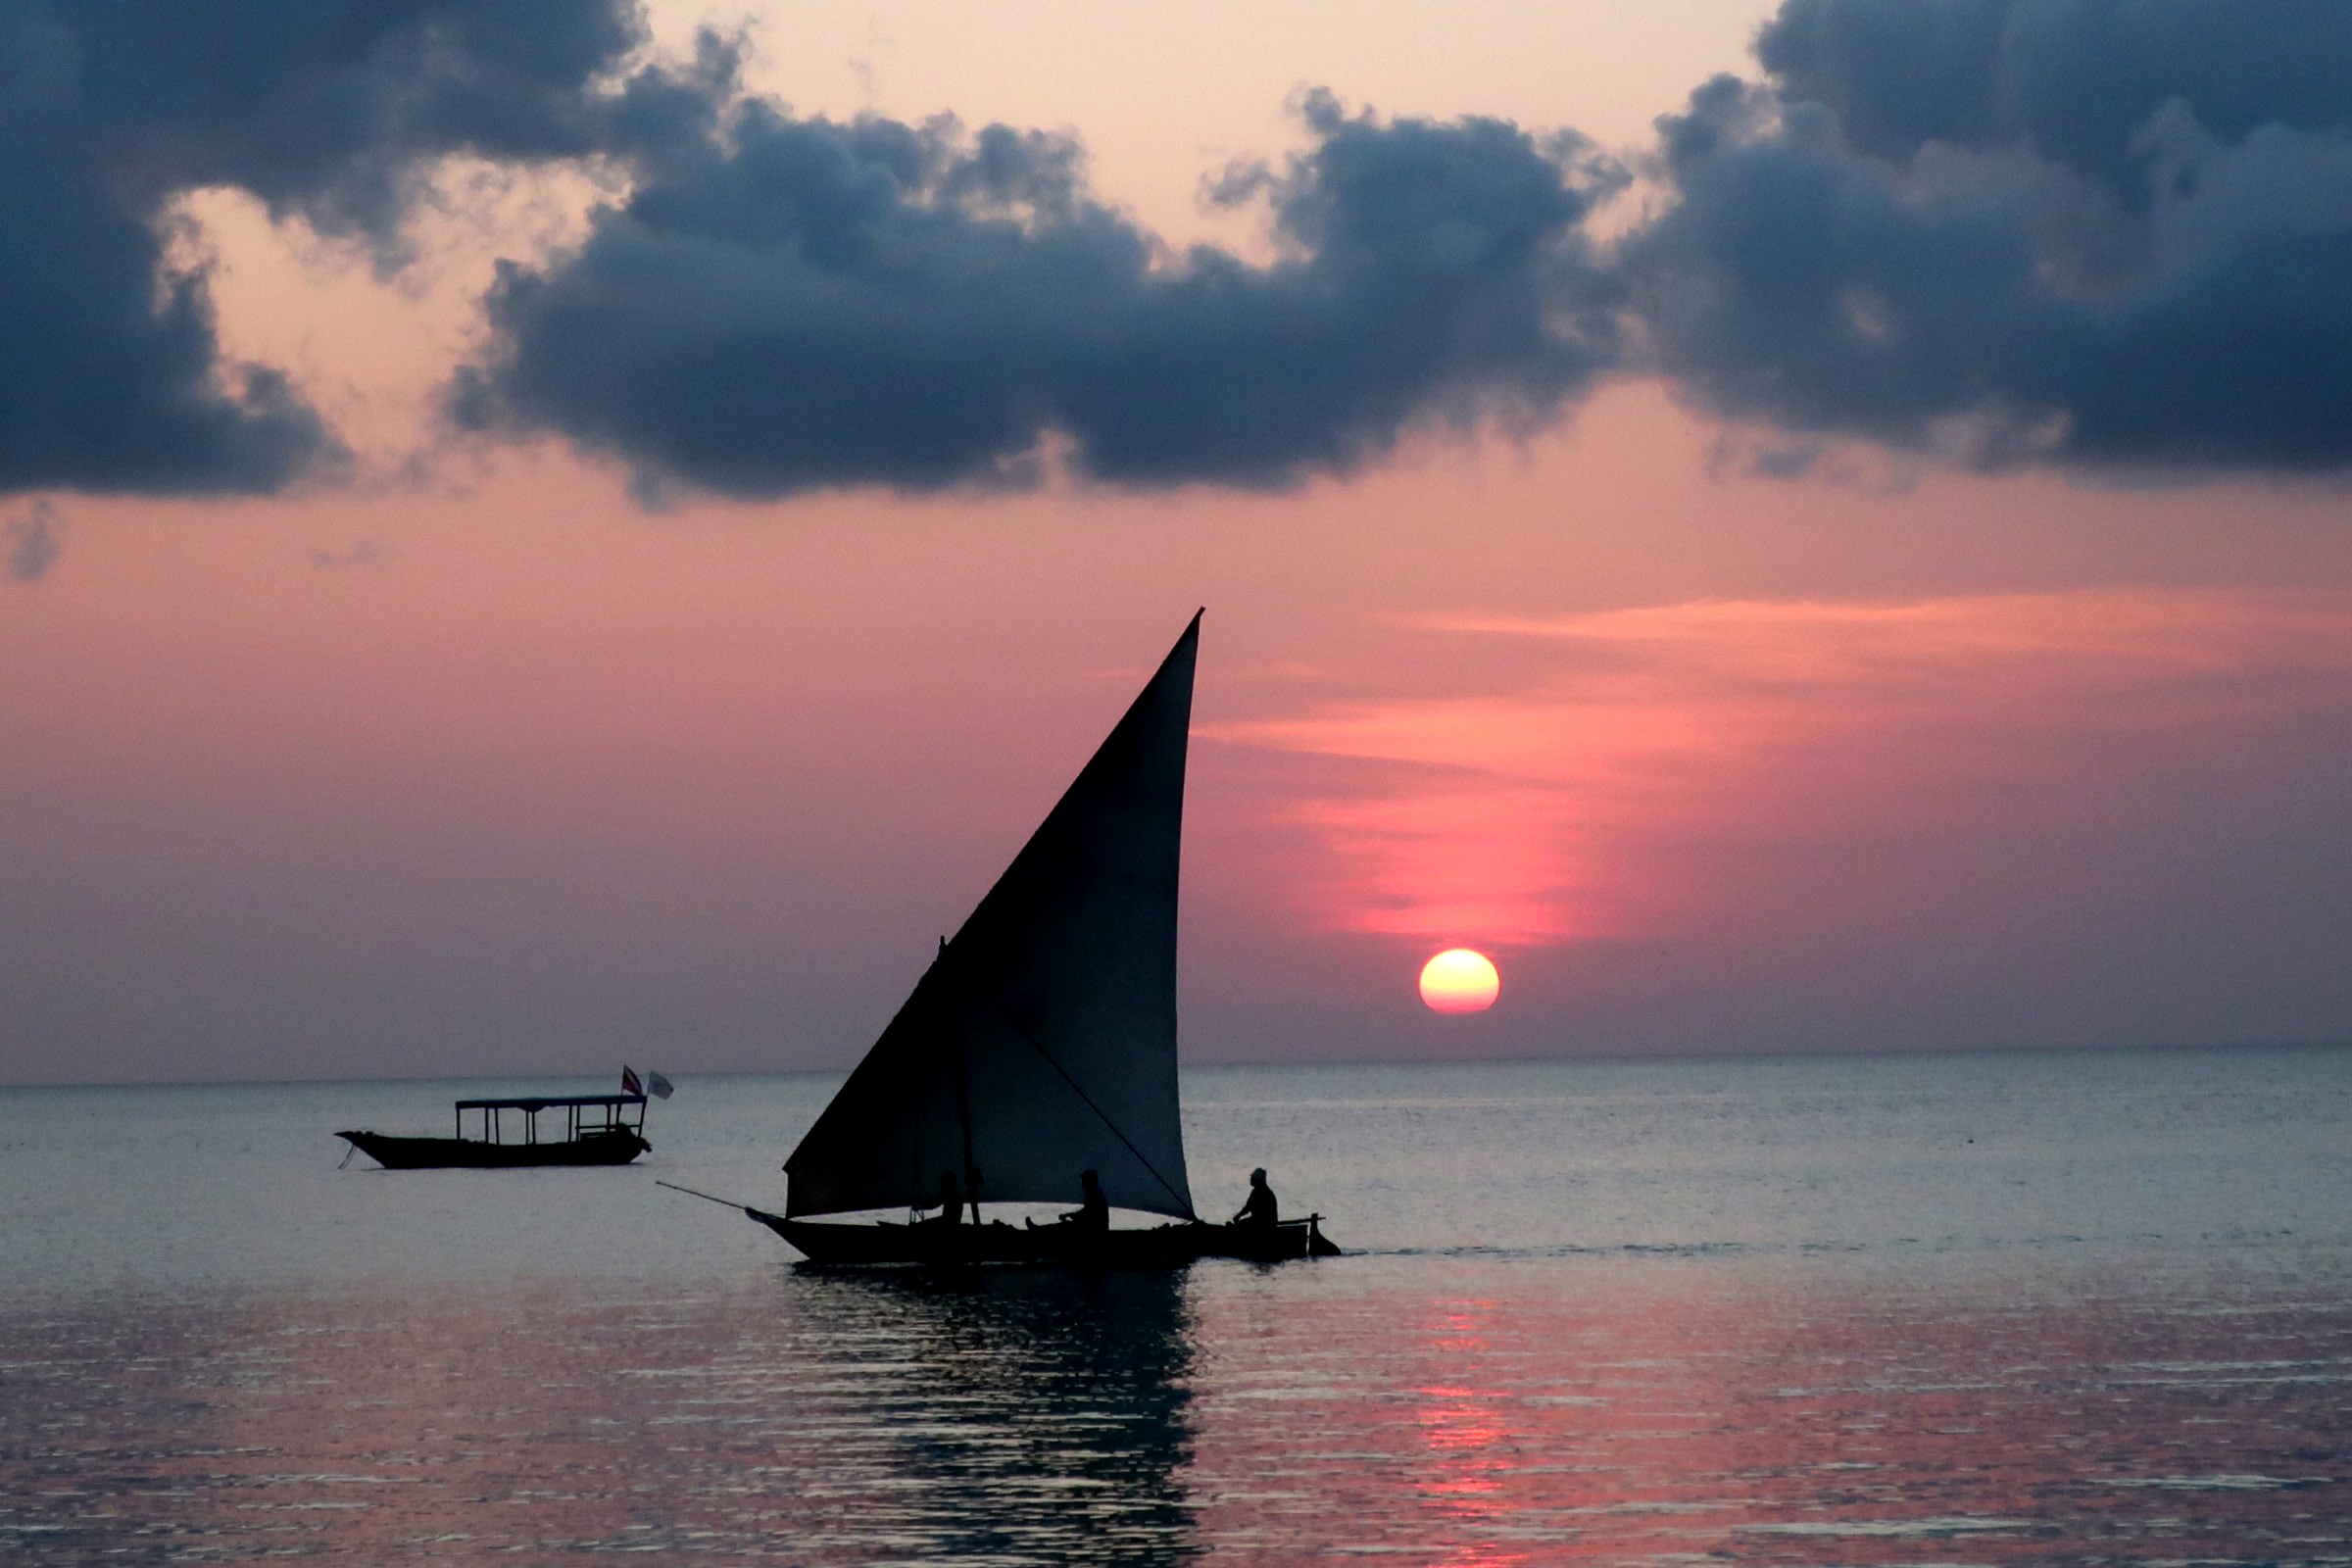 Photo of Zanzibar sunset by Camilla Frederiksen on Unsplash